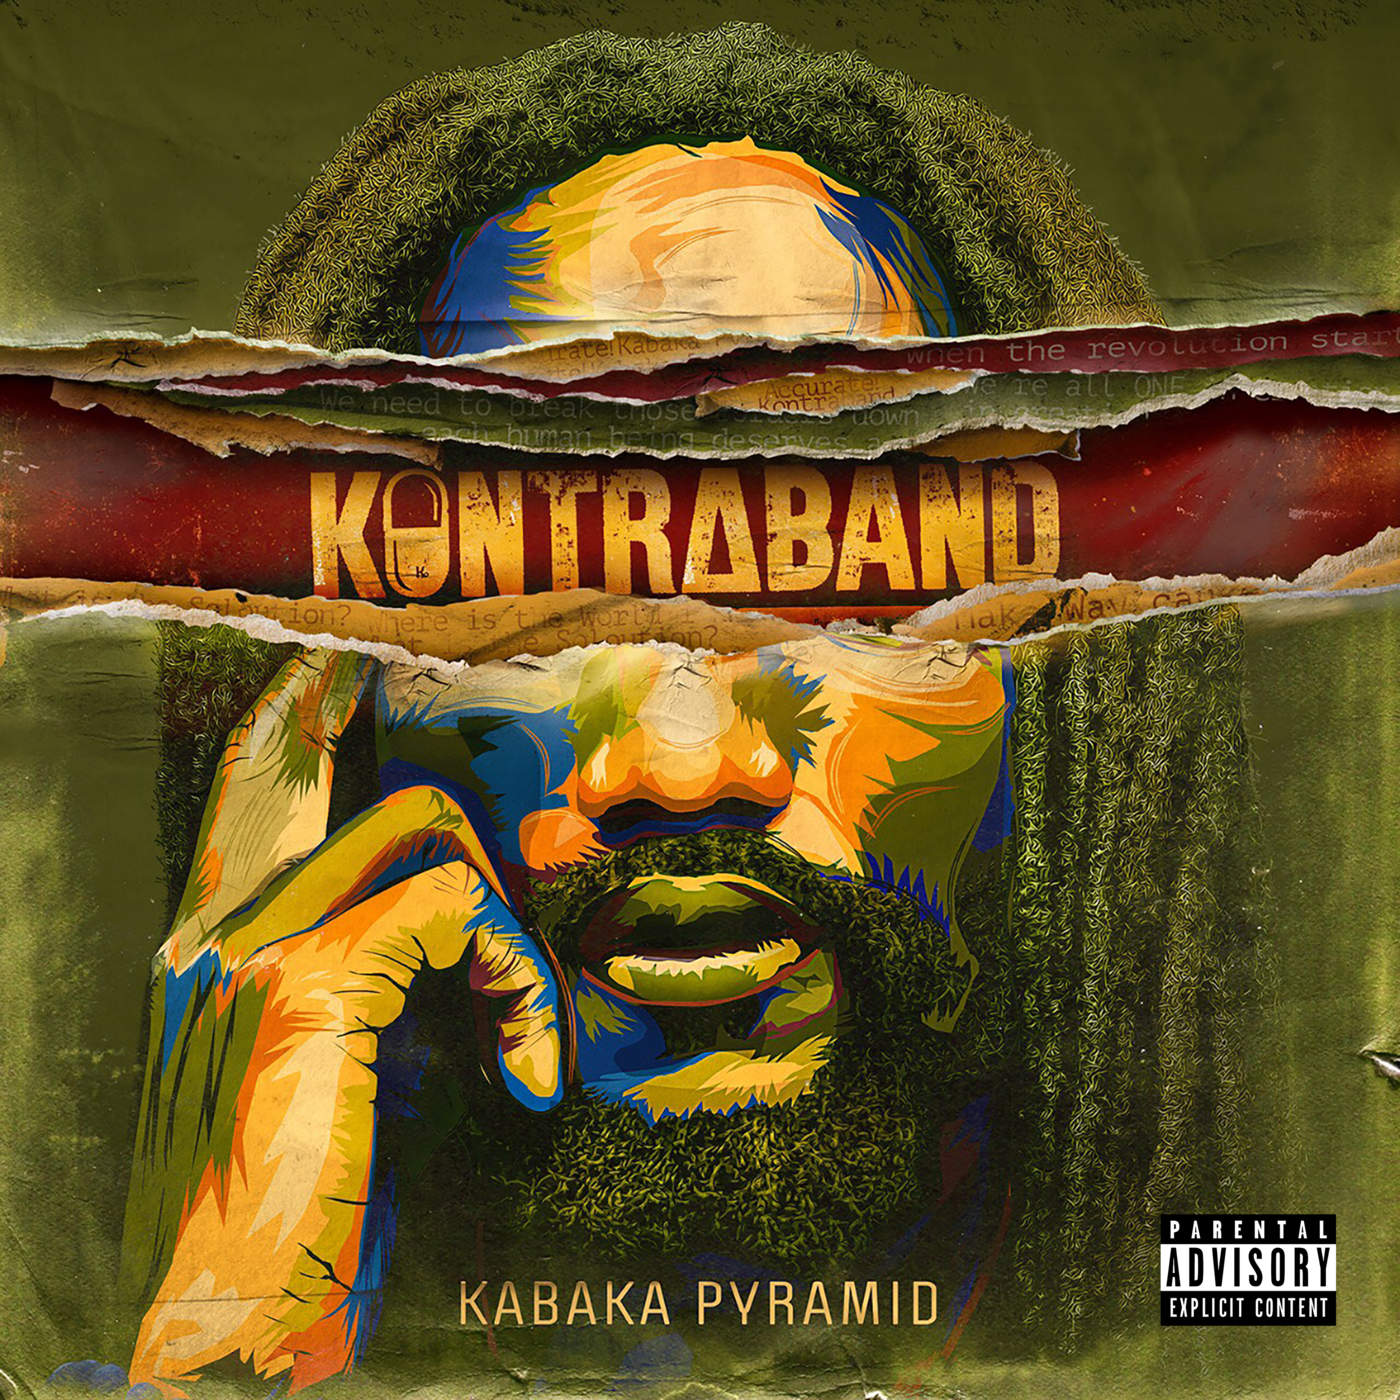 Kabaka Pyramid - Kontraband (2018) - Rasta Reggae Sounds